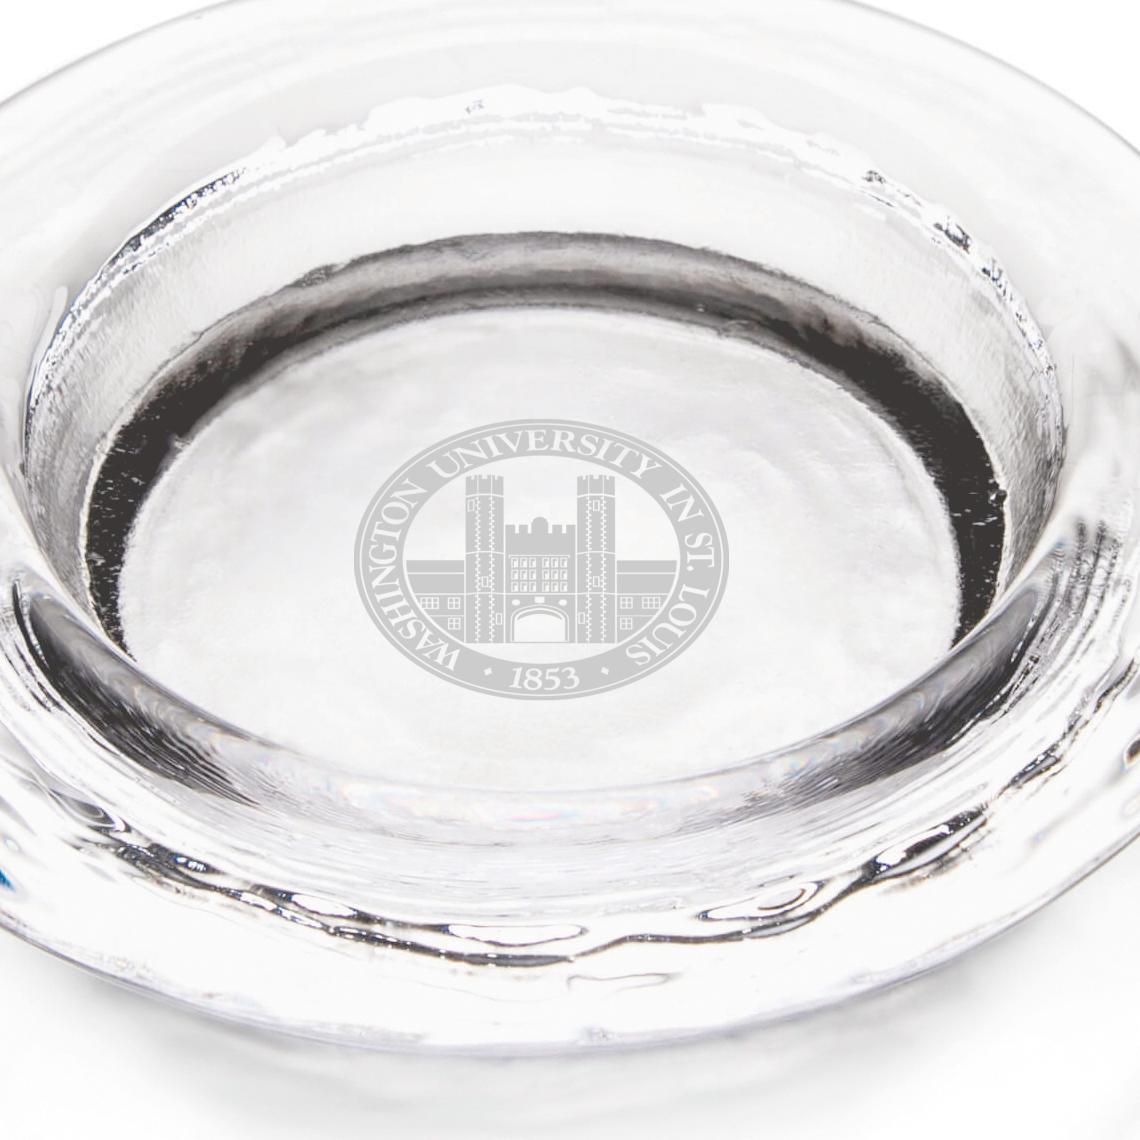 WUSTL Glass Wine Coaster by Simon Pearce - Image 2